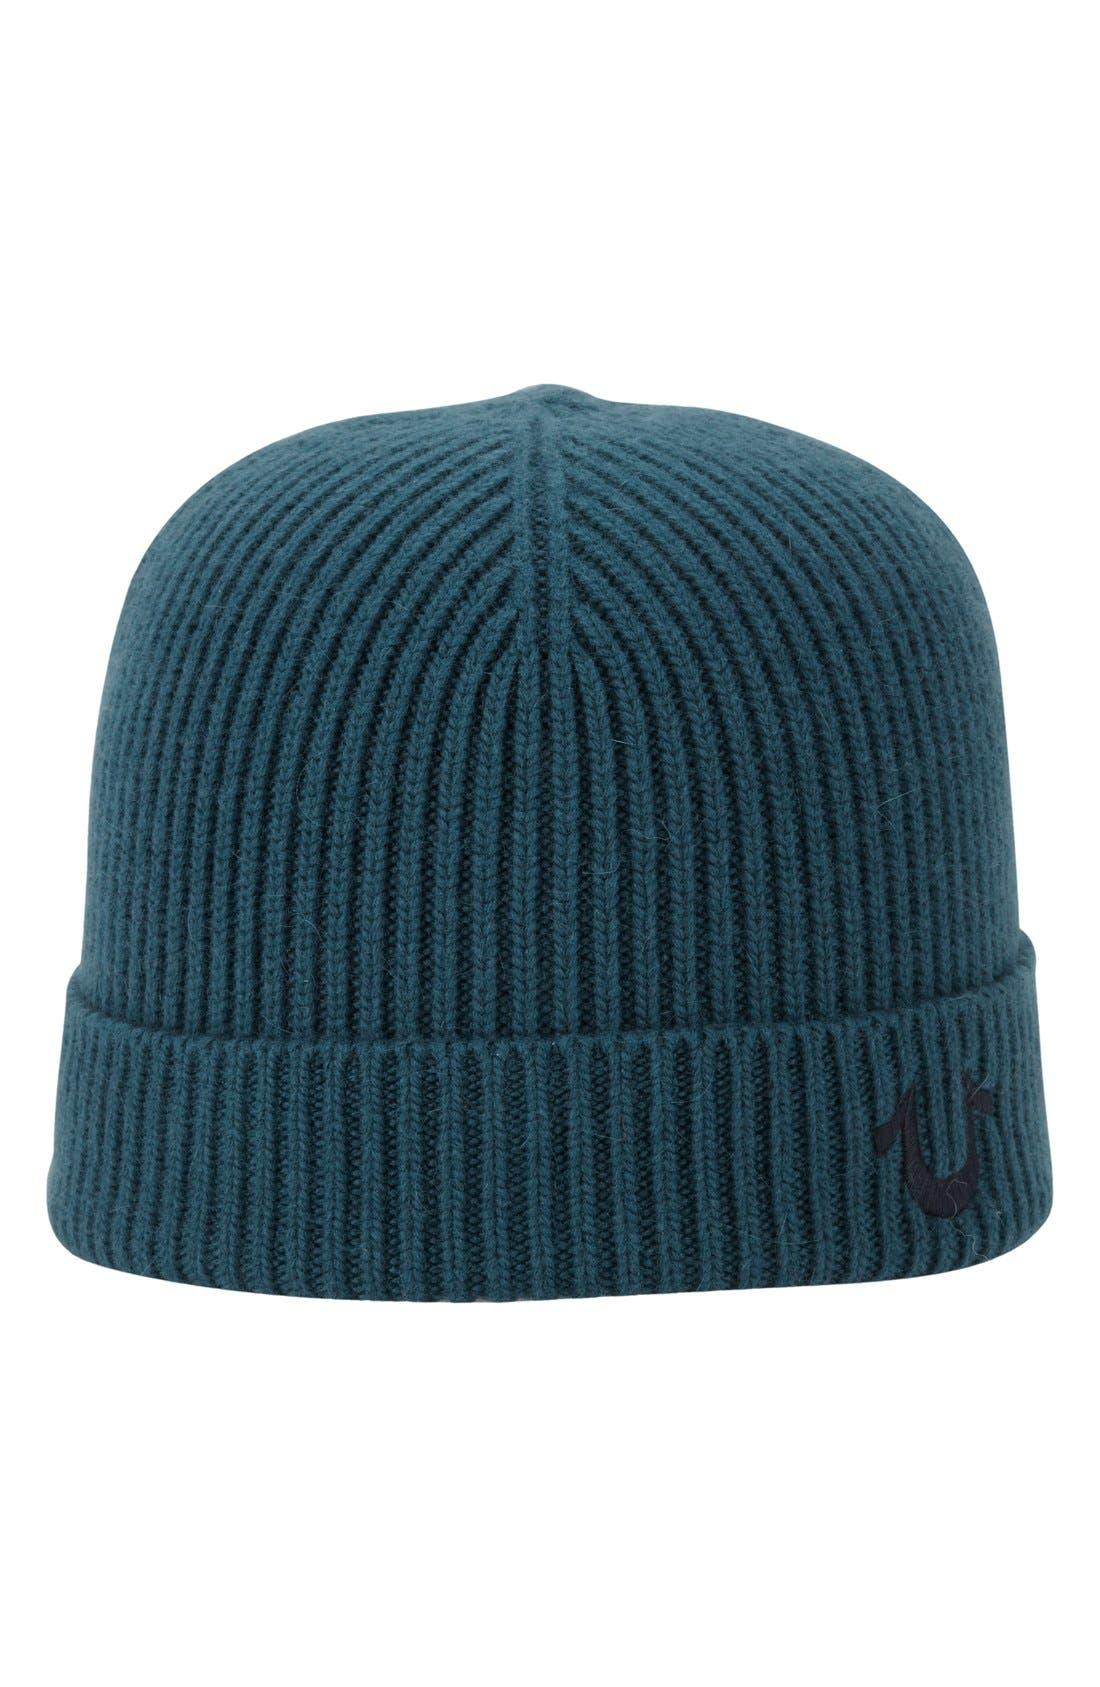 Main Image - True Religion Brand Jeans Rib Knit Cap